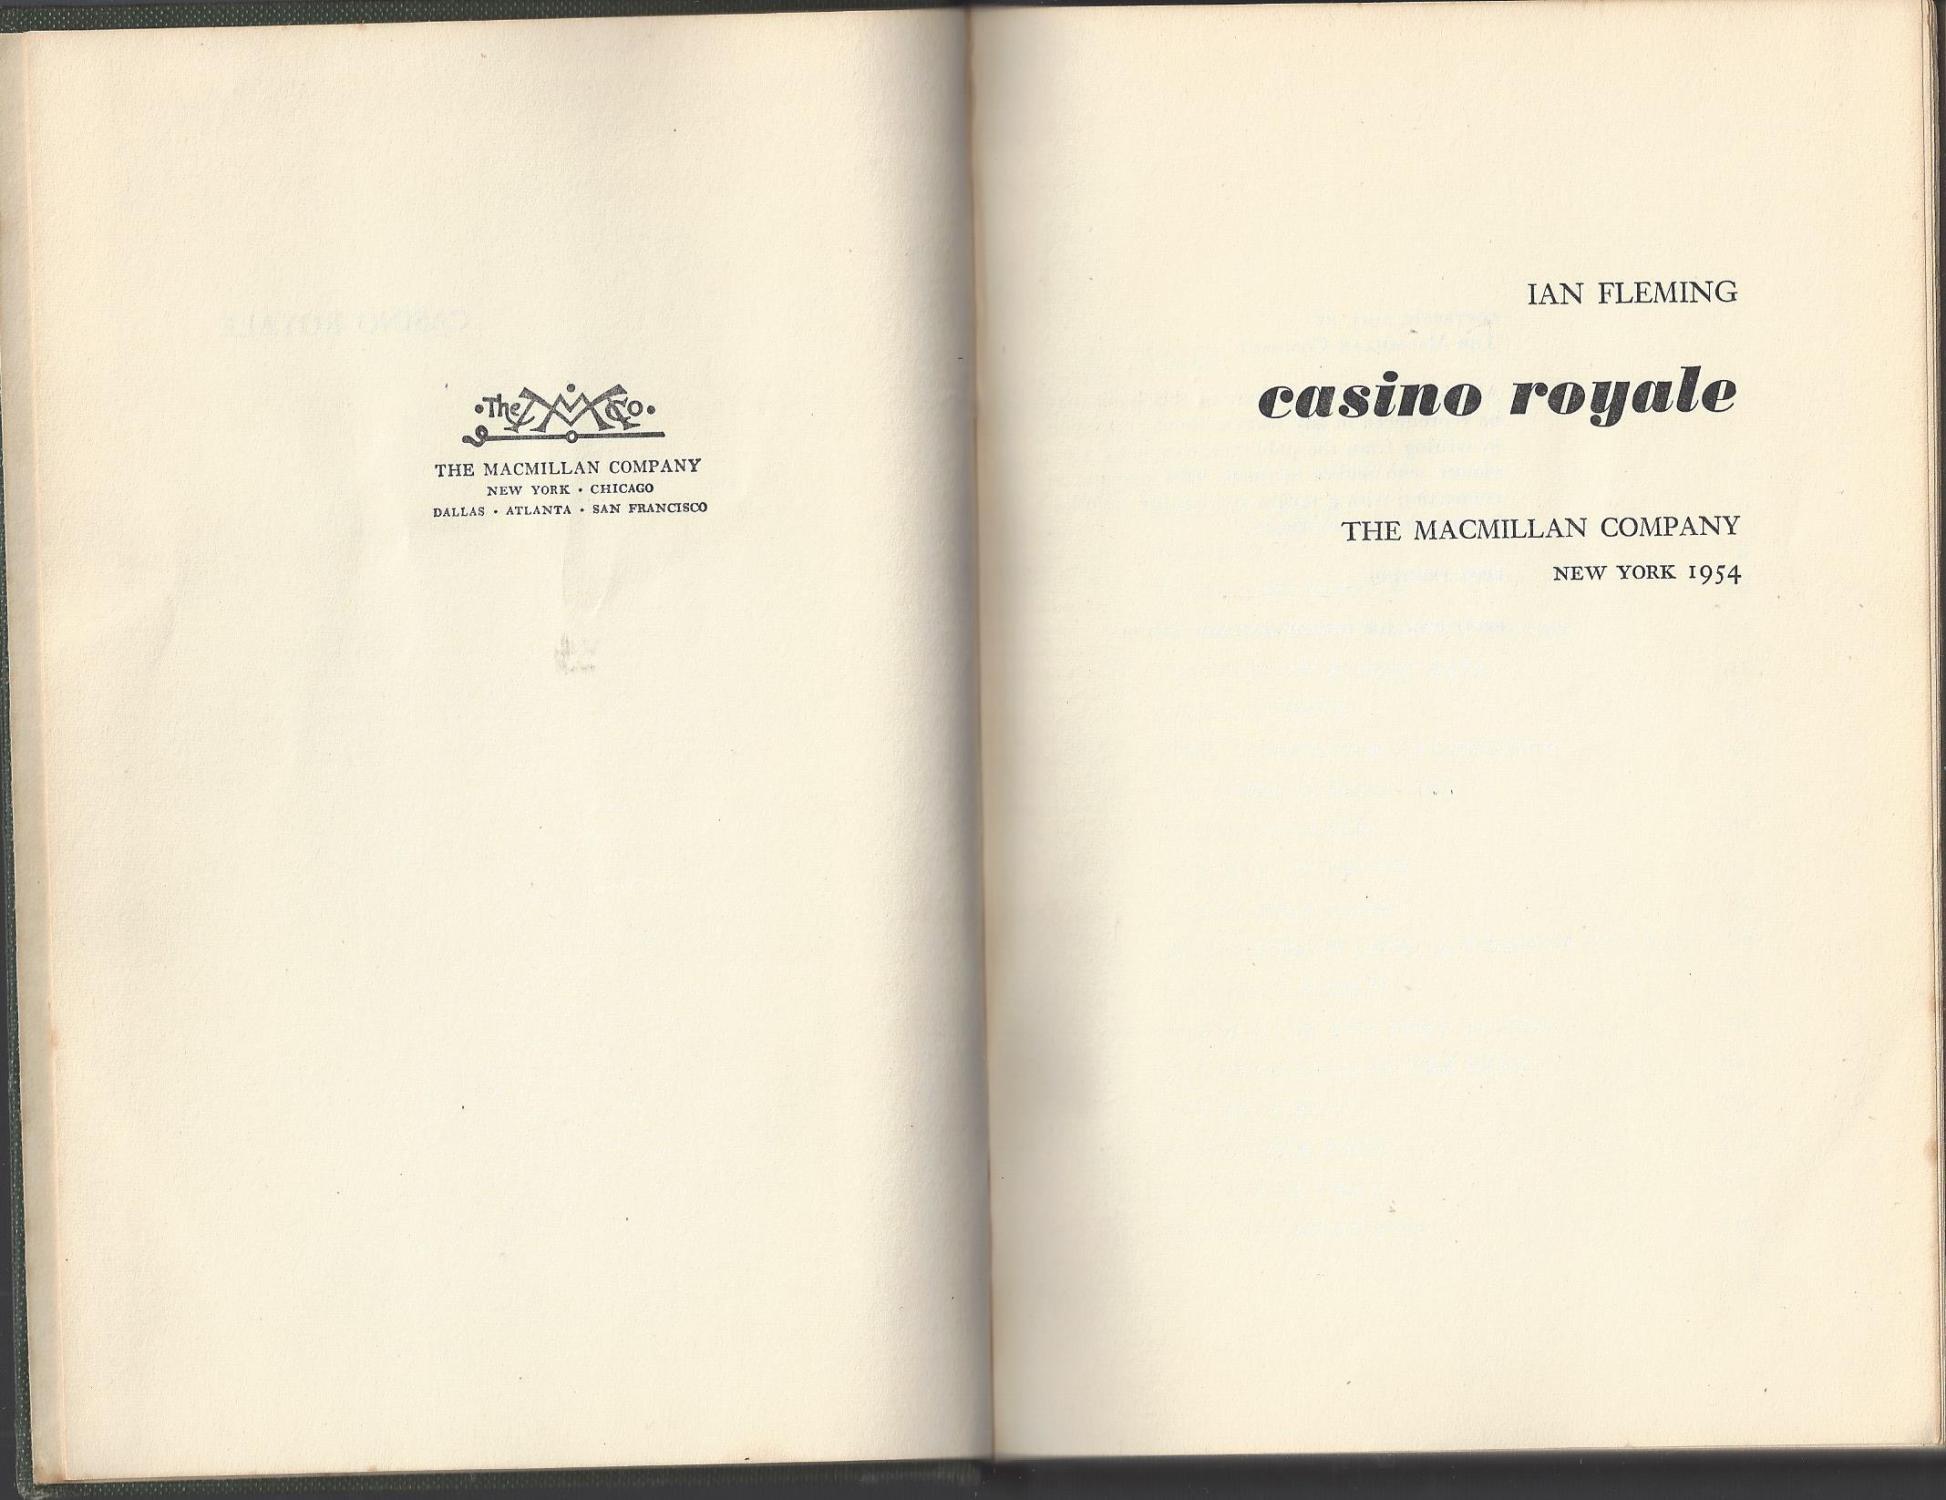 Casino royale 1954 macmillian edition play real casino slots for fun